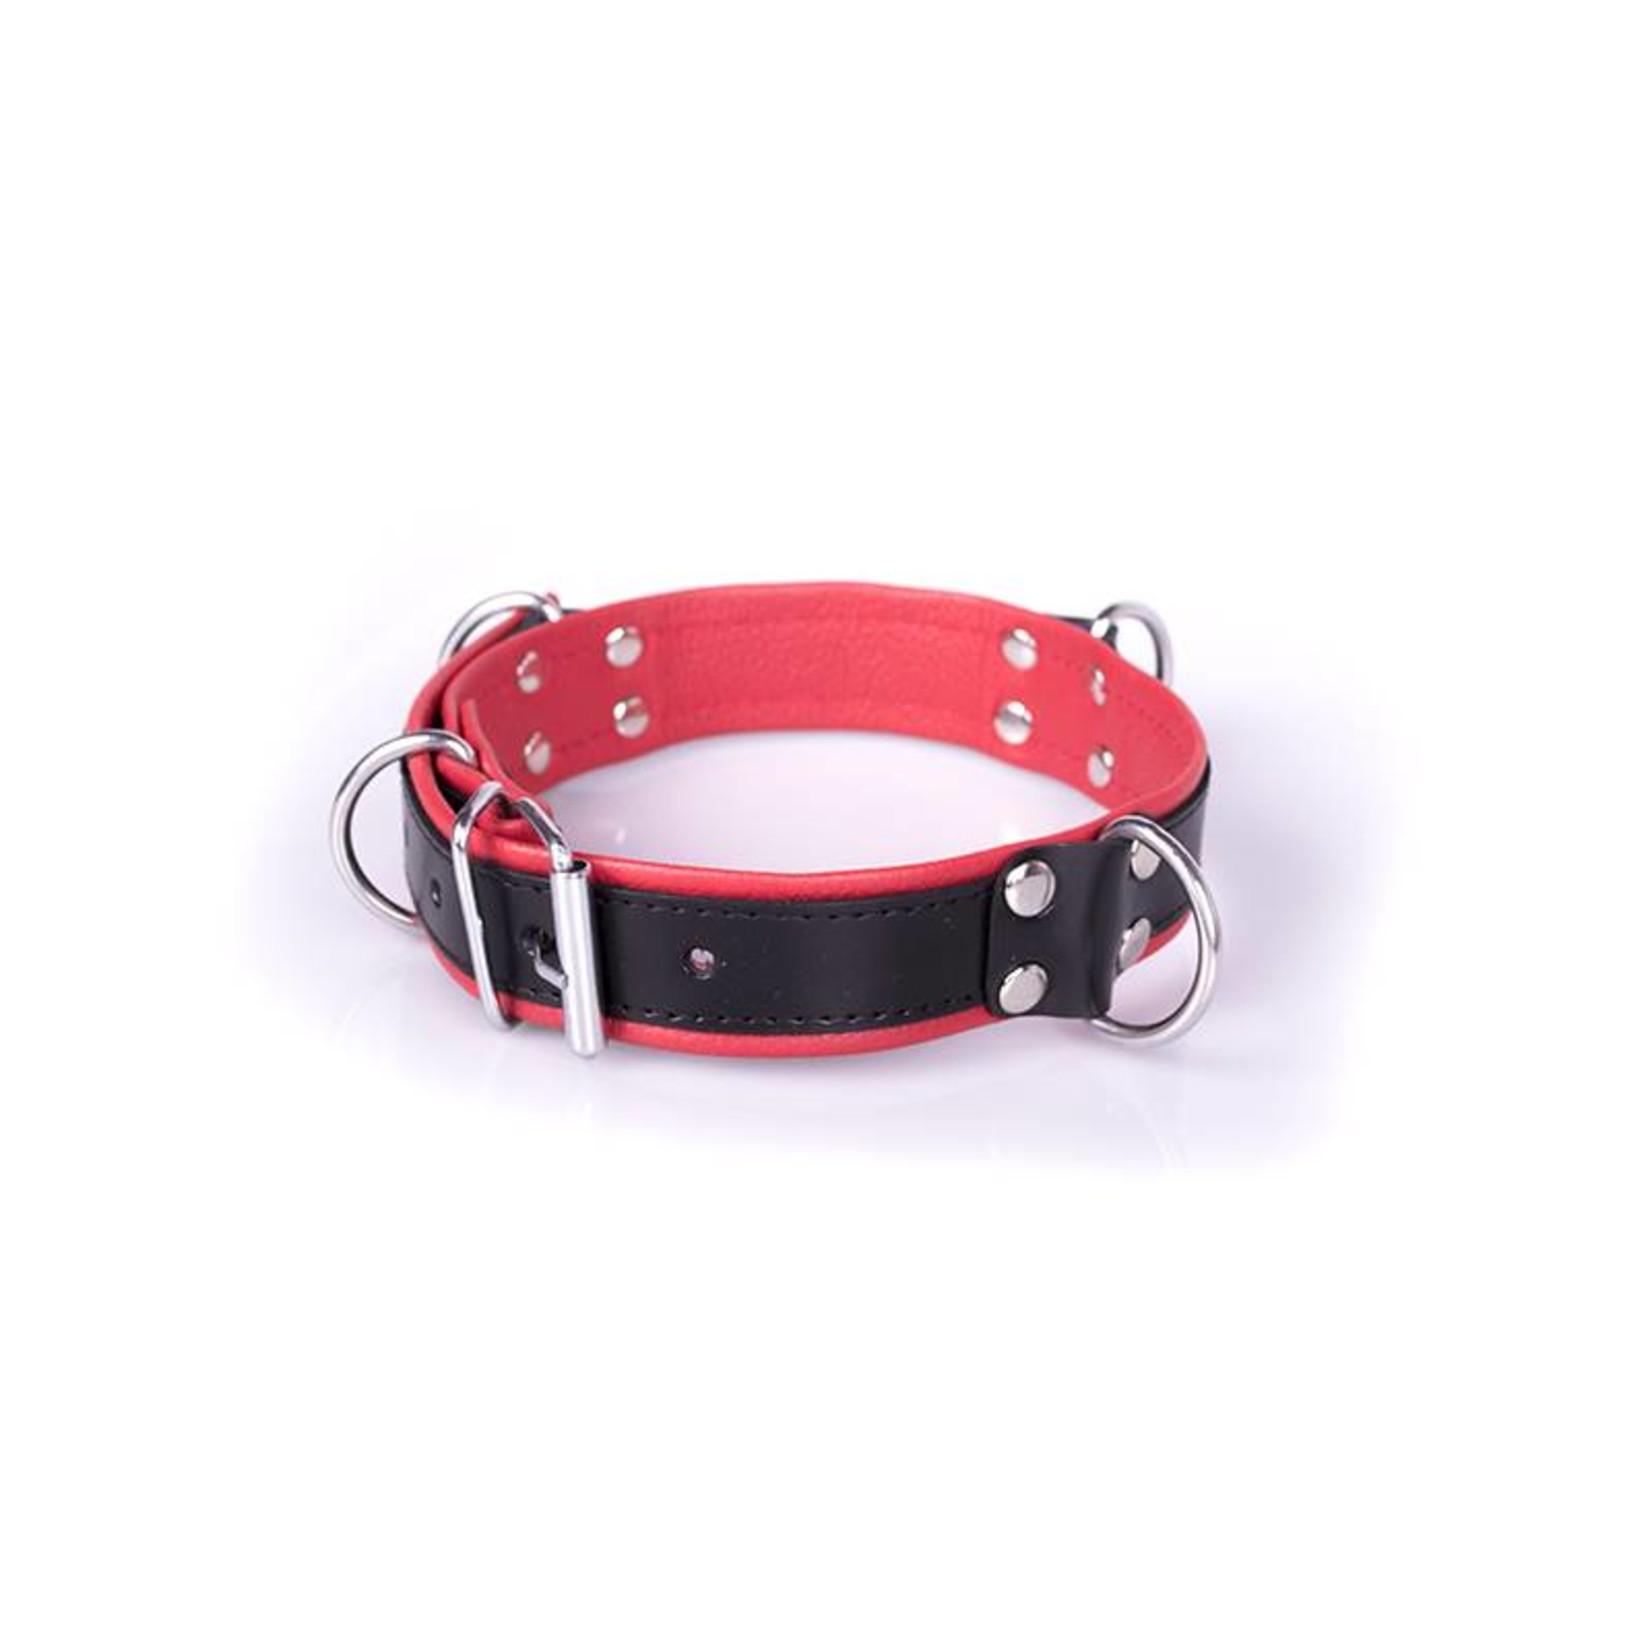 KIOTOS Steel Deluxe Bondage Collar - Black & Red